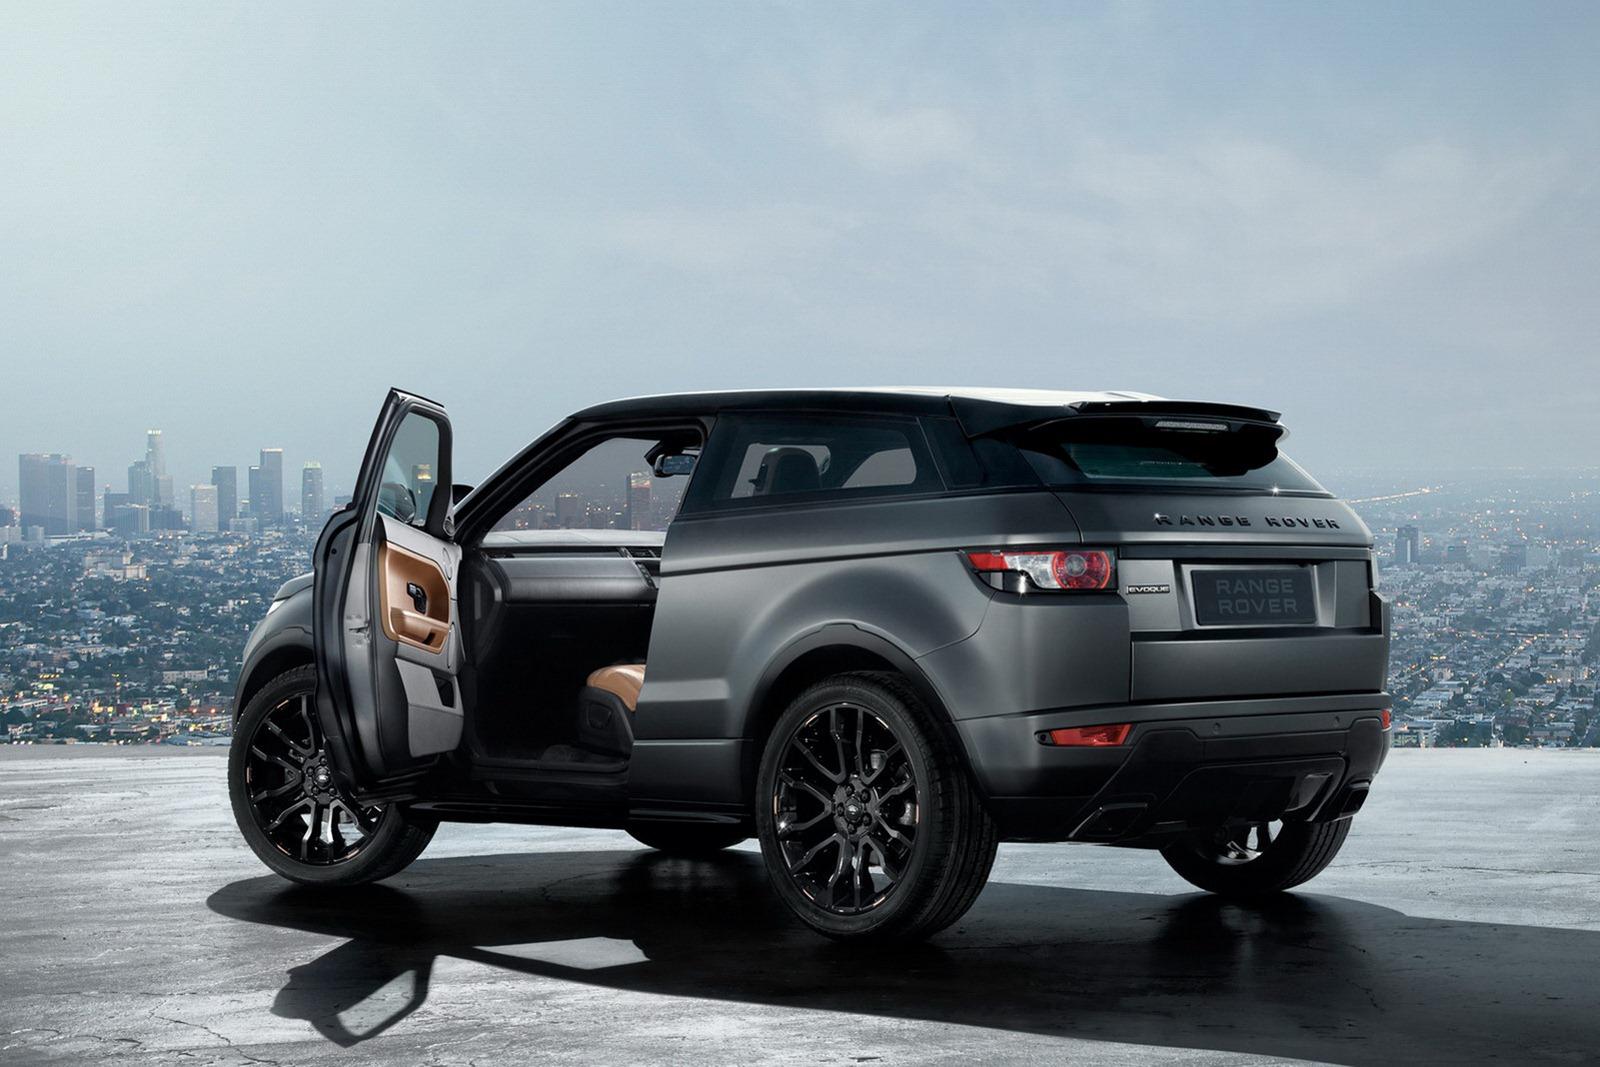 http://2.bp.blogspot.com/-dG_WwHCKoYs/T5XES9DT4HI/AAAAAAAAE7k/EnqoraIprcc/s1600/Range-Rover-Evoque-SE-Victoria-Beckham-14%255B6%255D.jpg